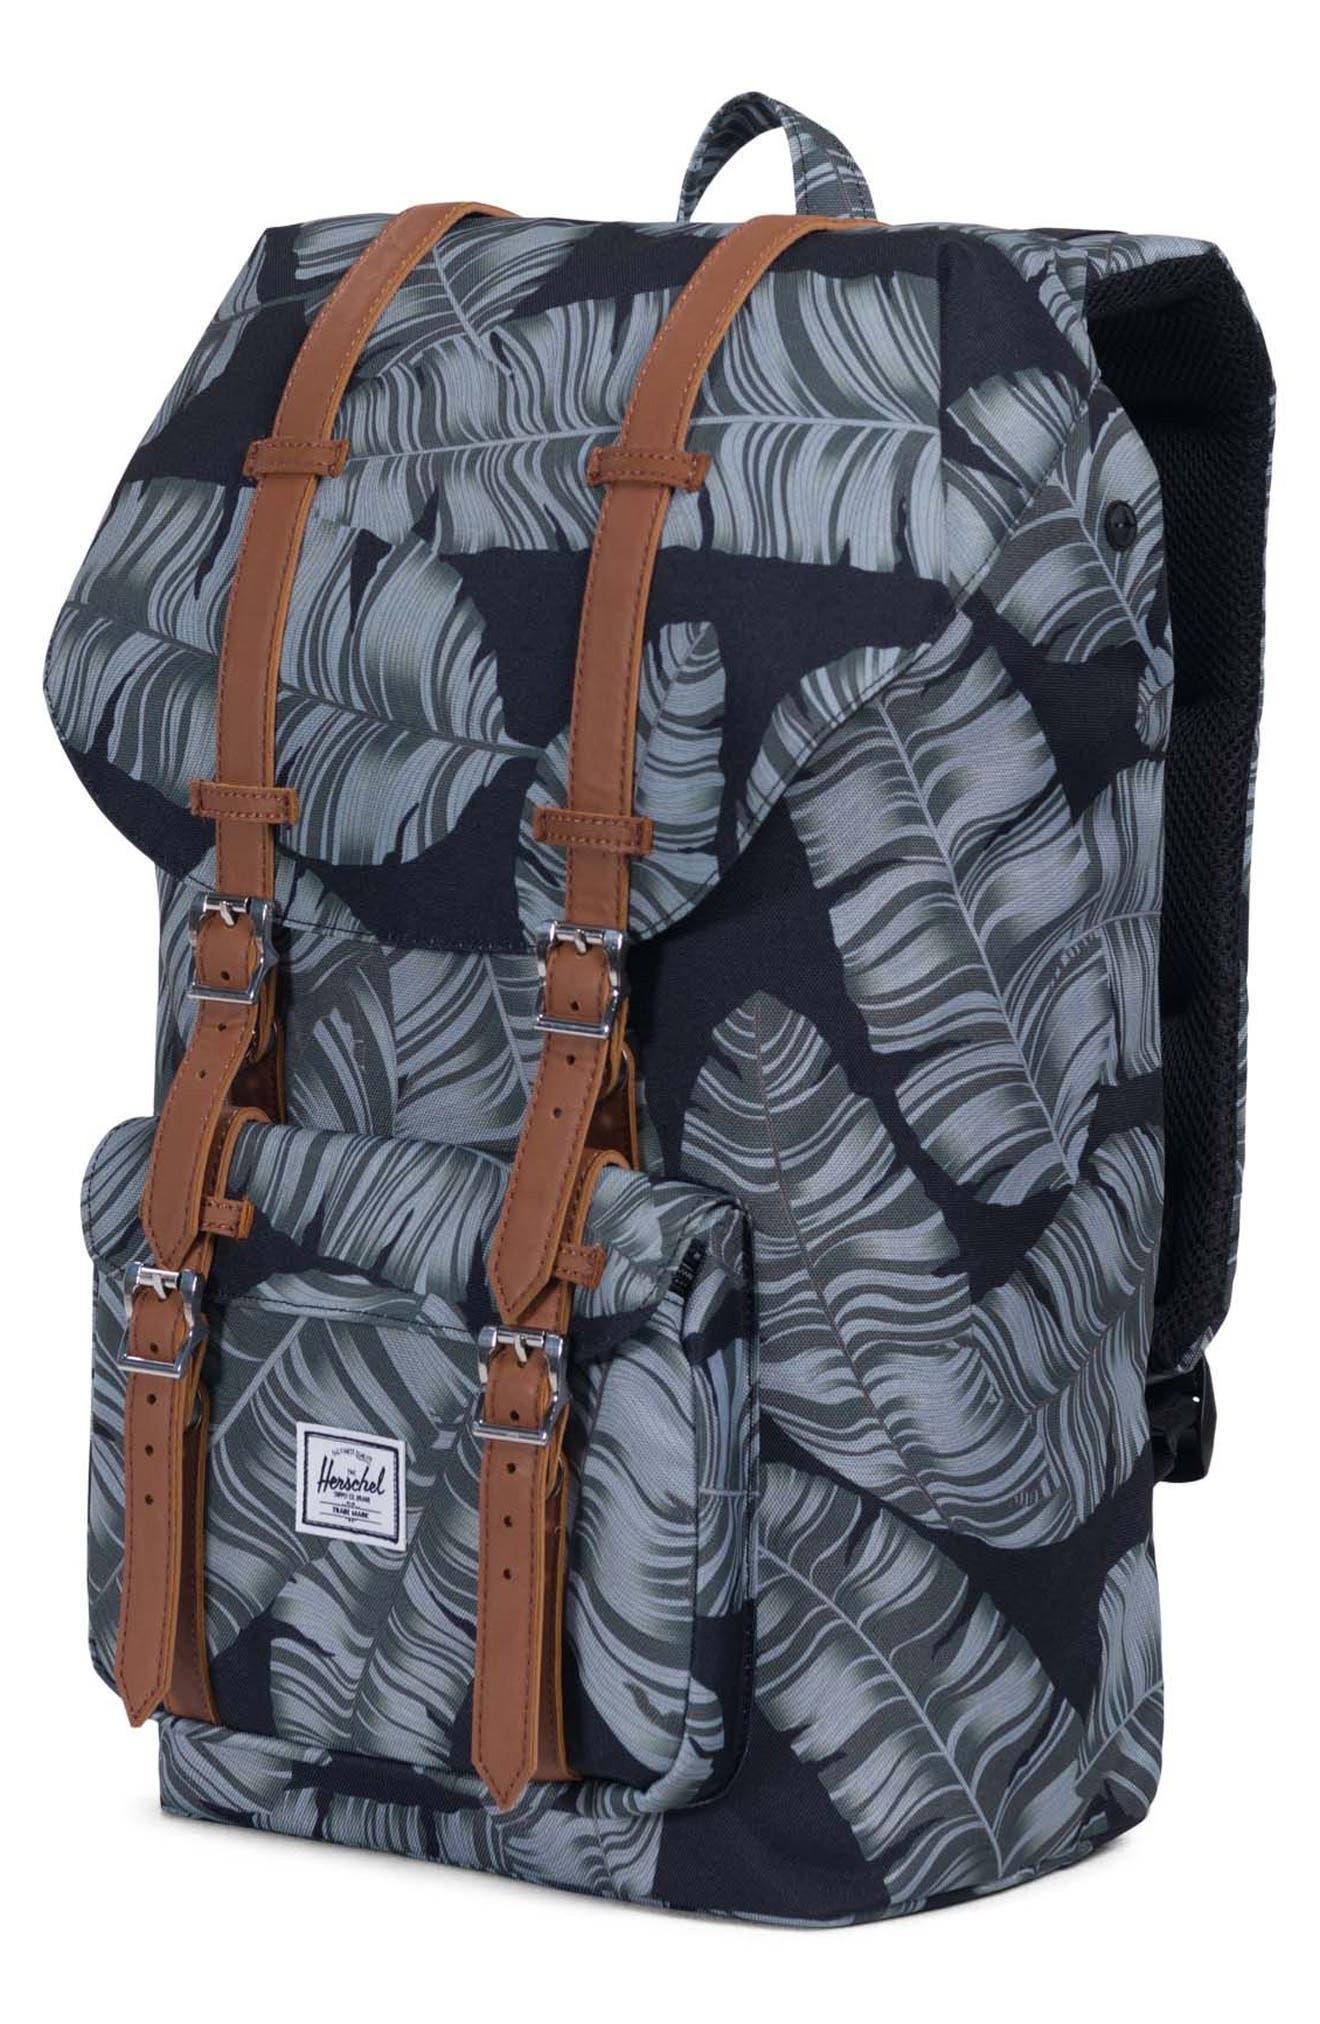 Little America Palm Print Backpack,                             Alternate thumbnail 4, color,                             Black Palm